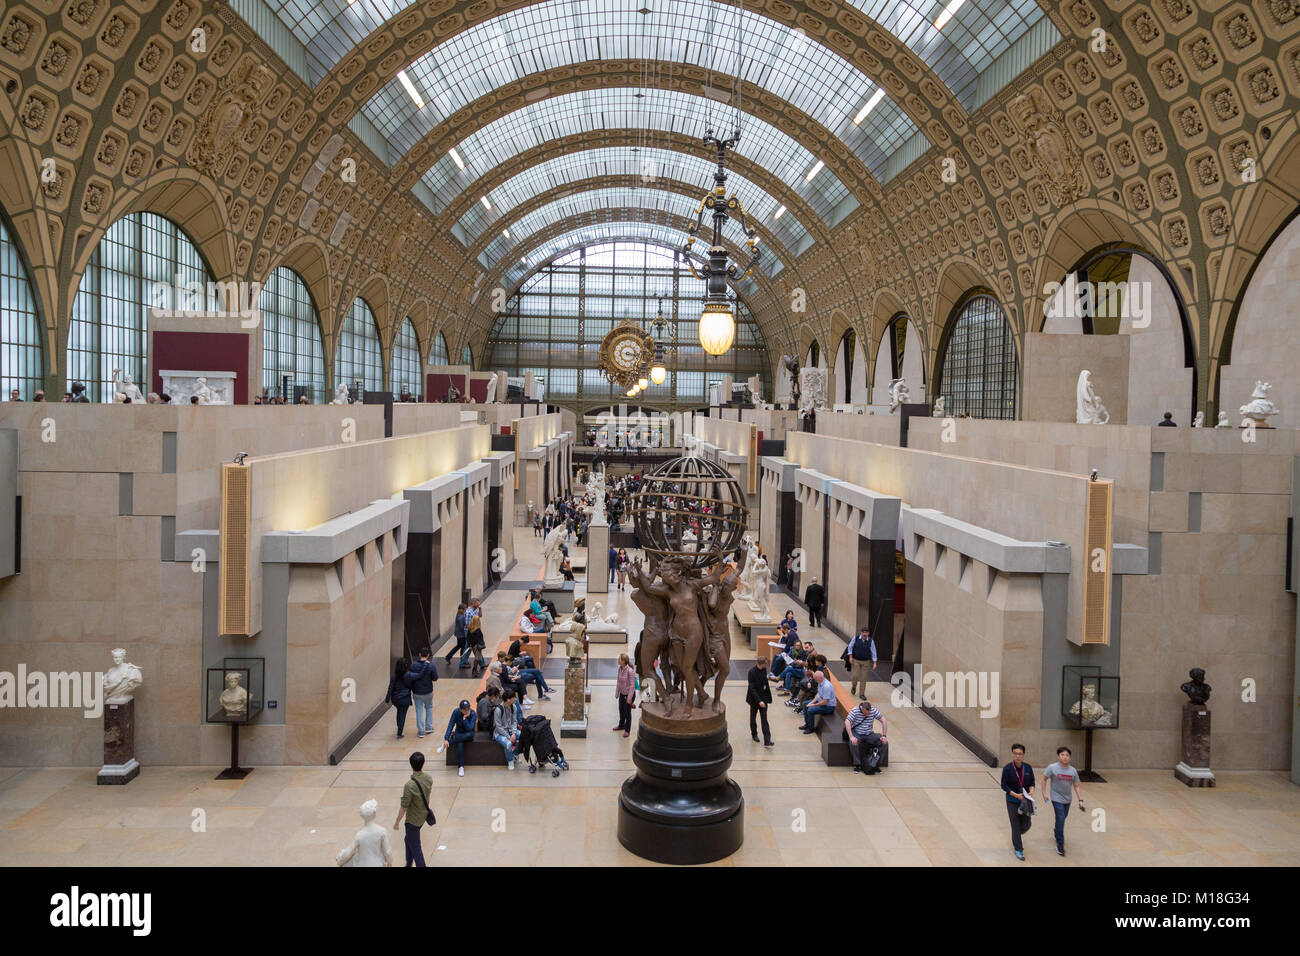 D Art Exhibition Jbr : Orsay museum french art paris stock photos